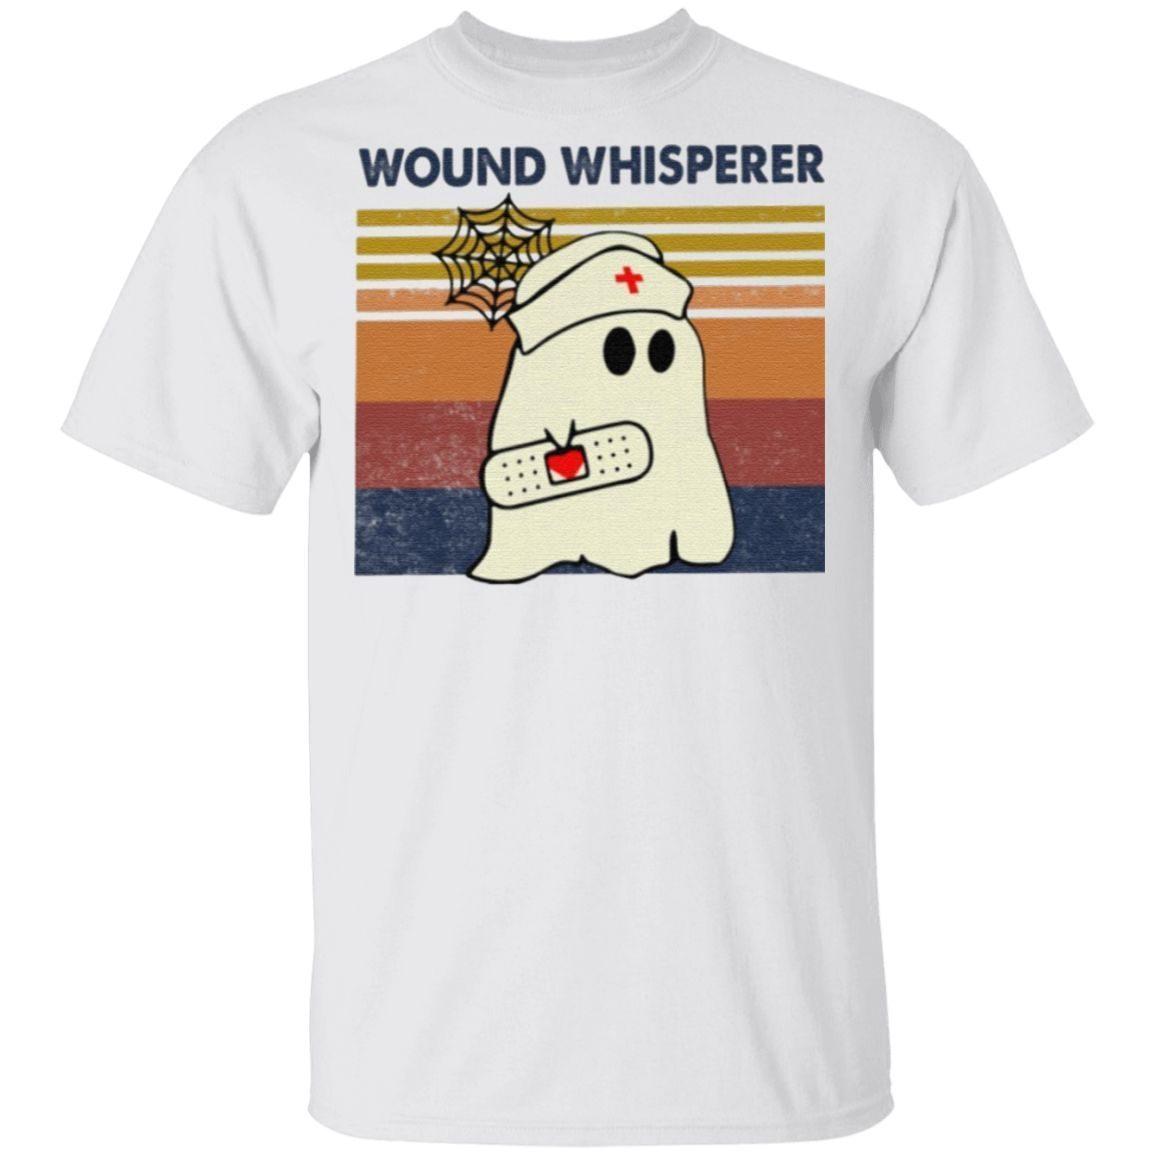 Wound Whisperer Nurse Boo Ghost t shirt